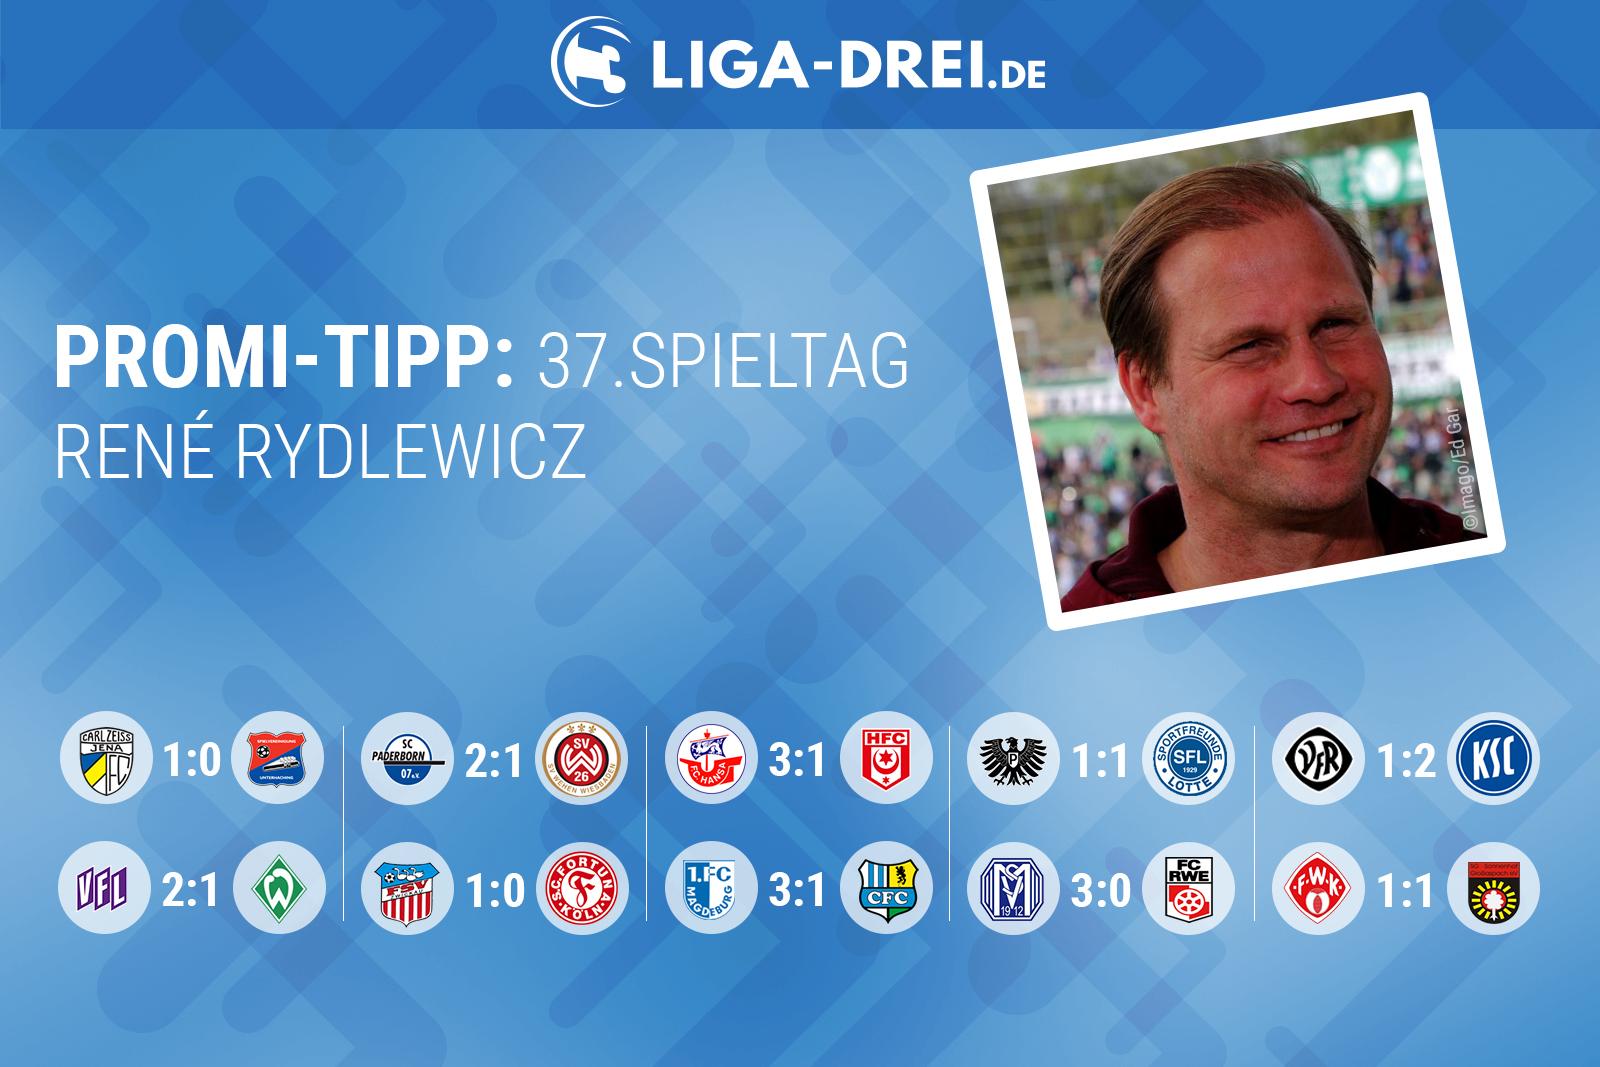 René Rydlewicz beim Liga-Drei.de Promi Tipp